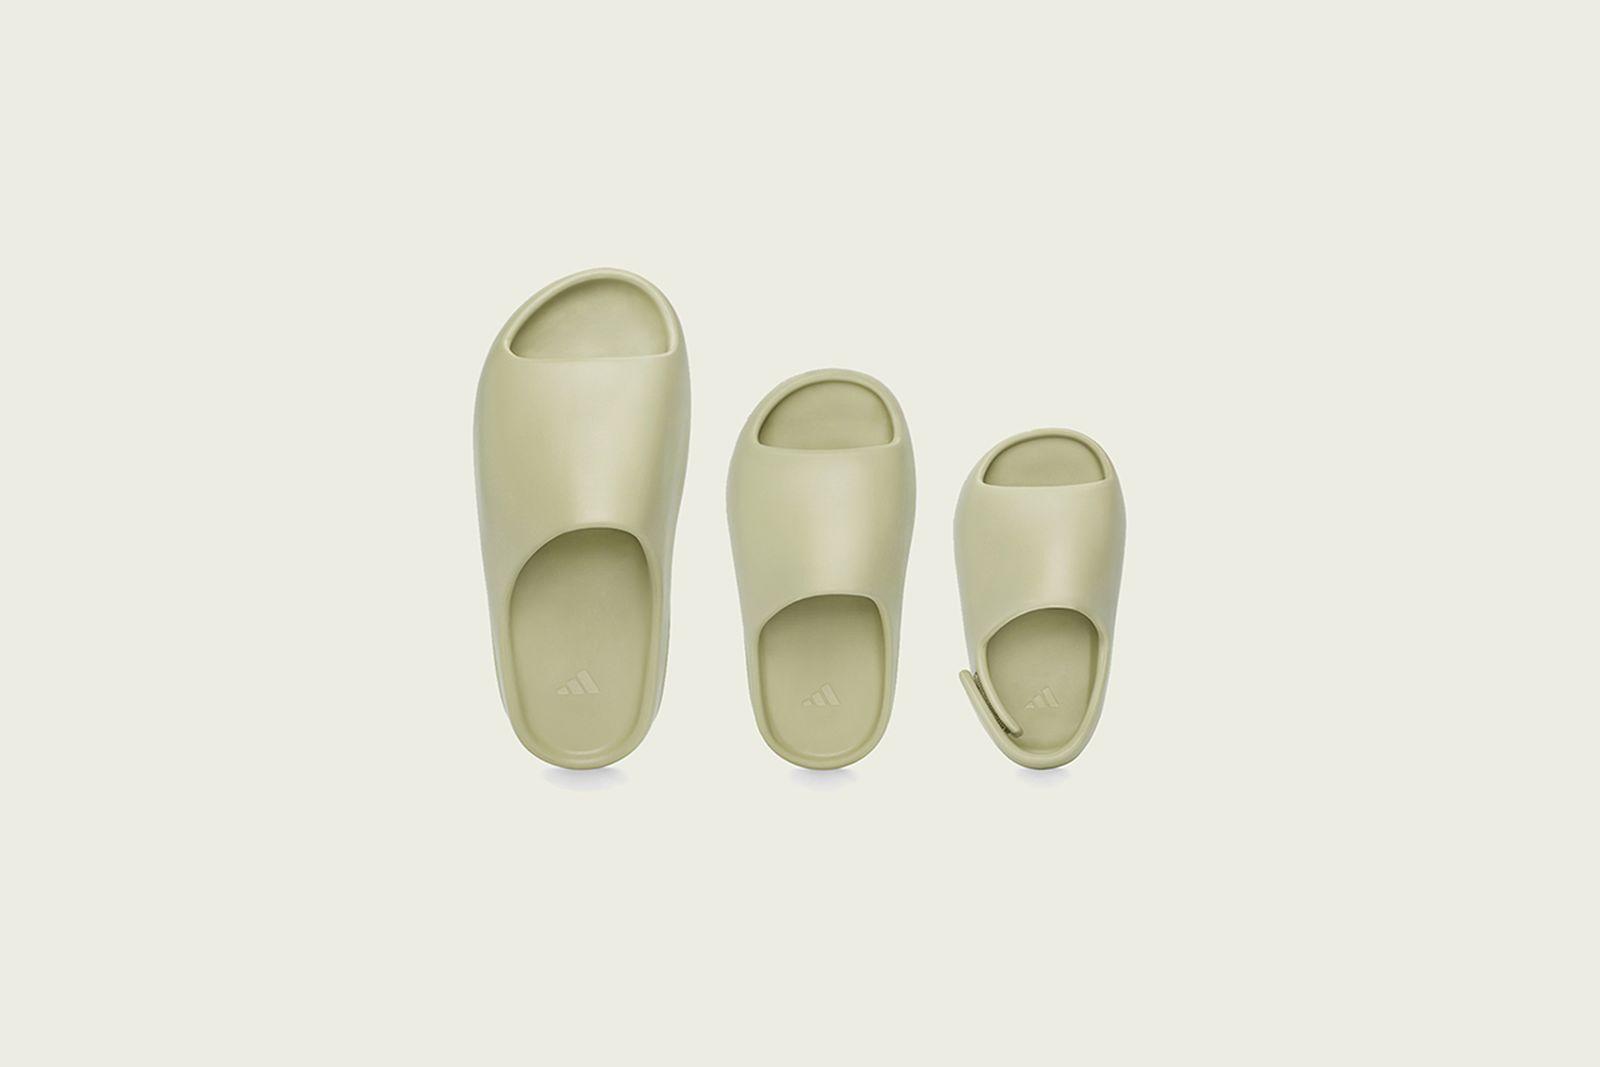 adidas-yeezy-slide-release-date-price-16